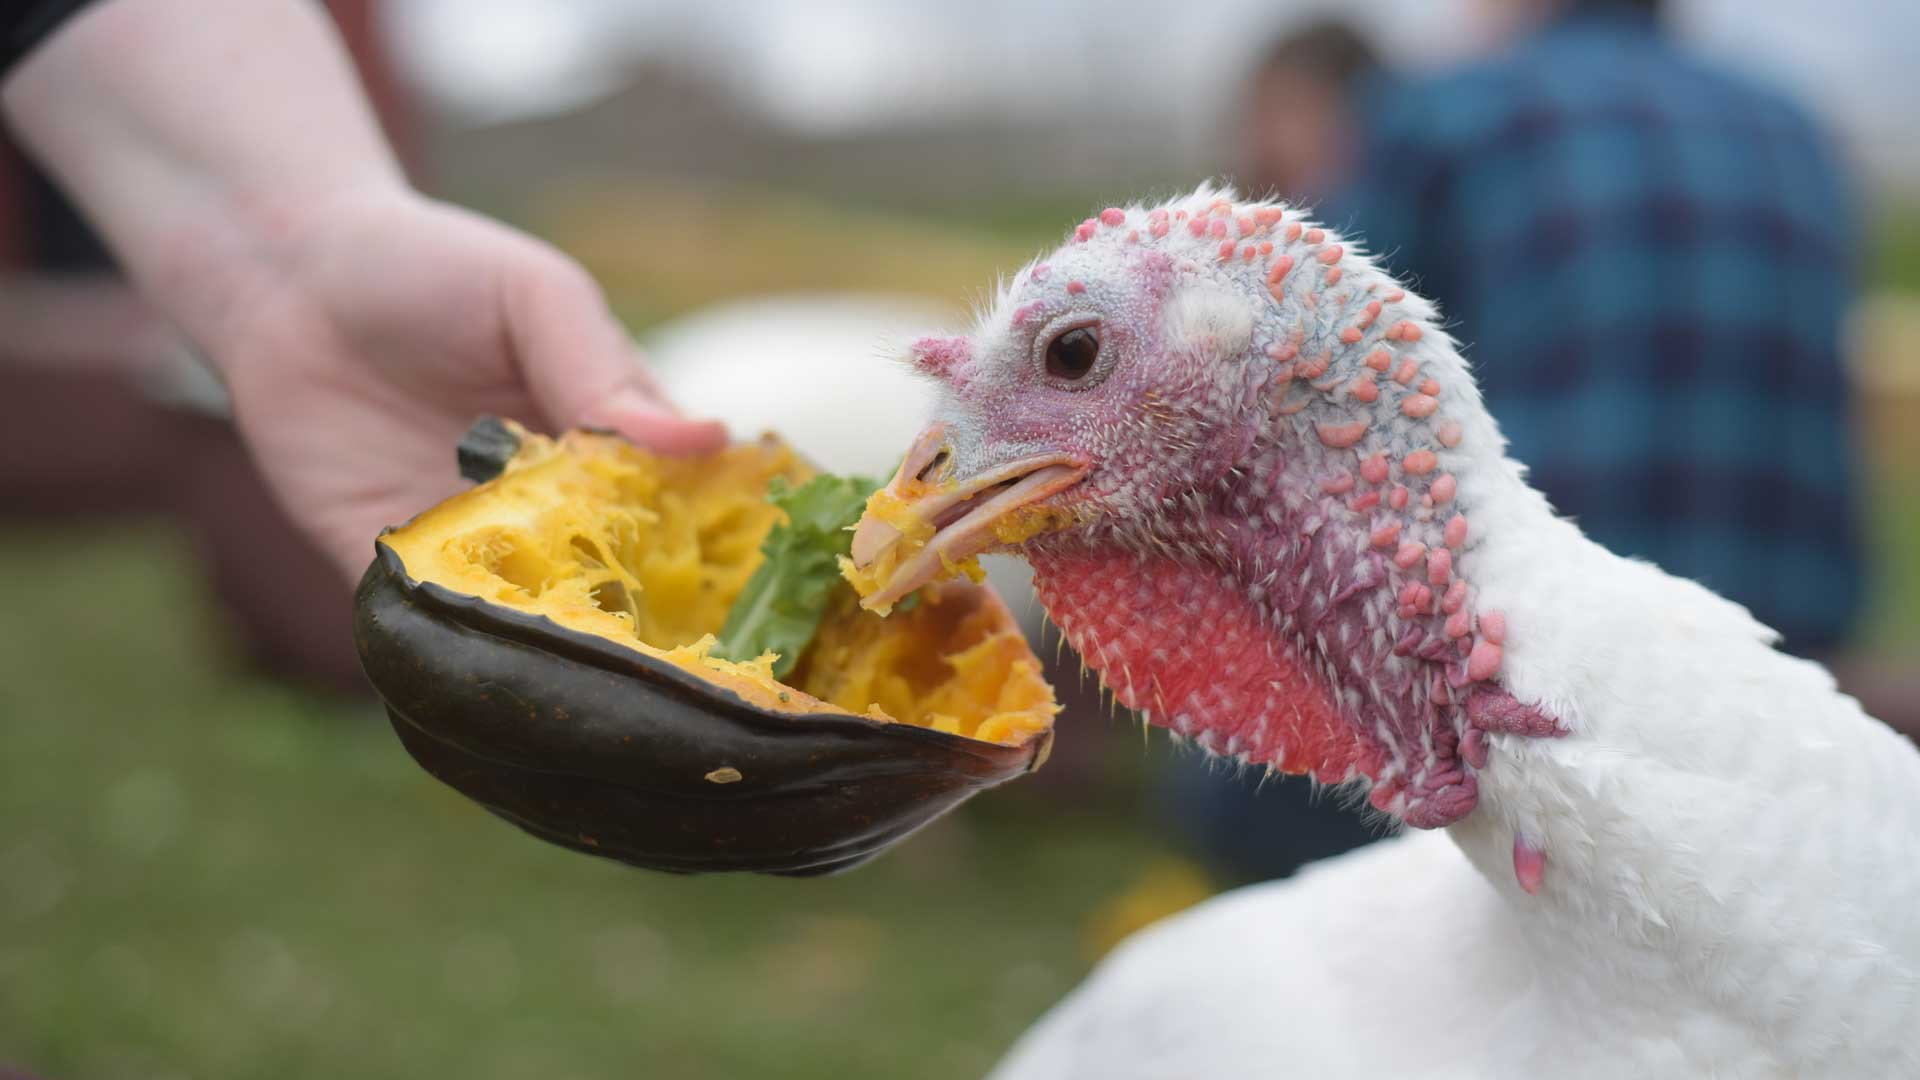 Turkey eating a tasty snack at Farm Sanctuary's Celebration for the Turkeys